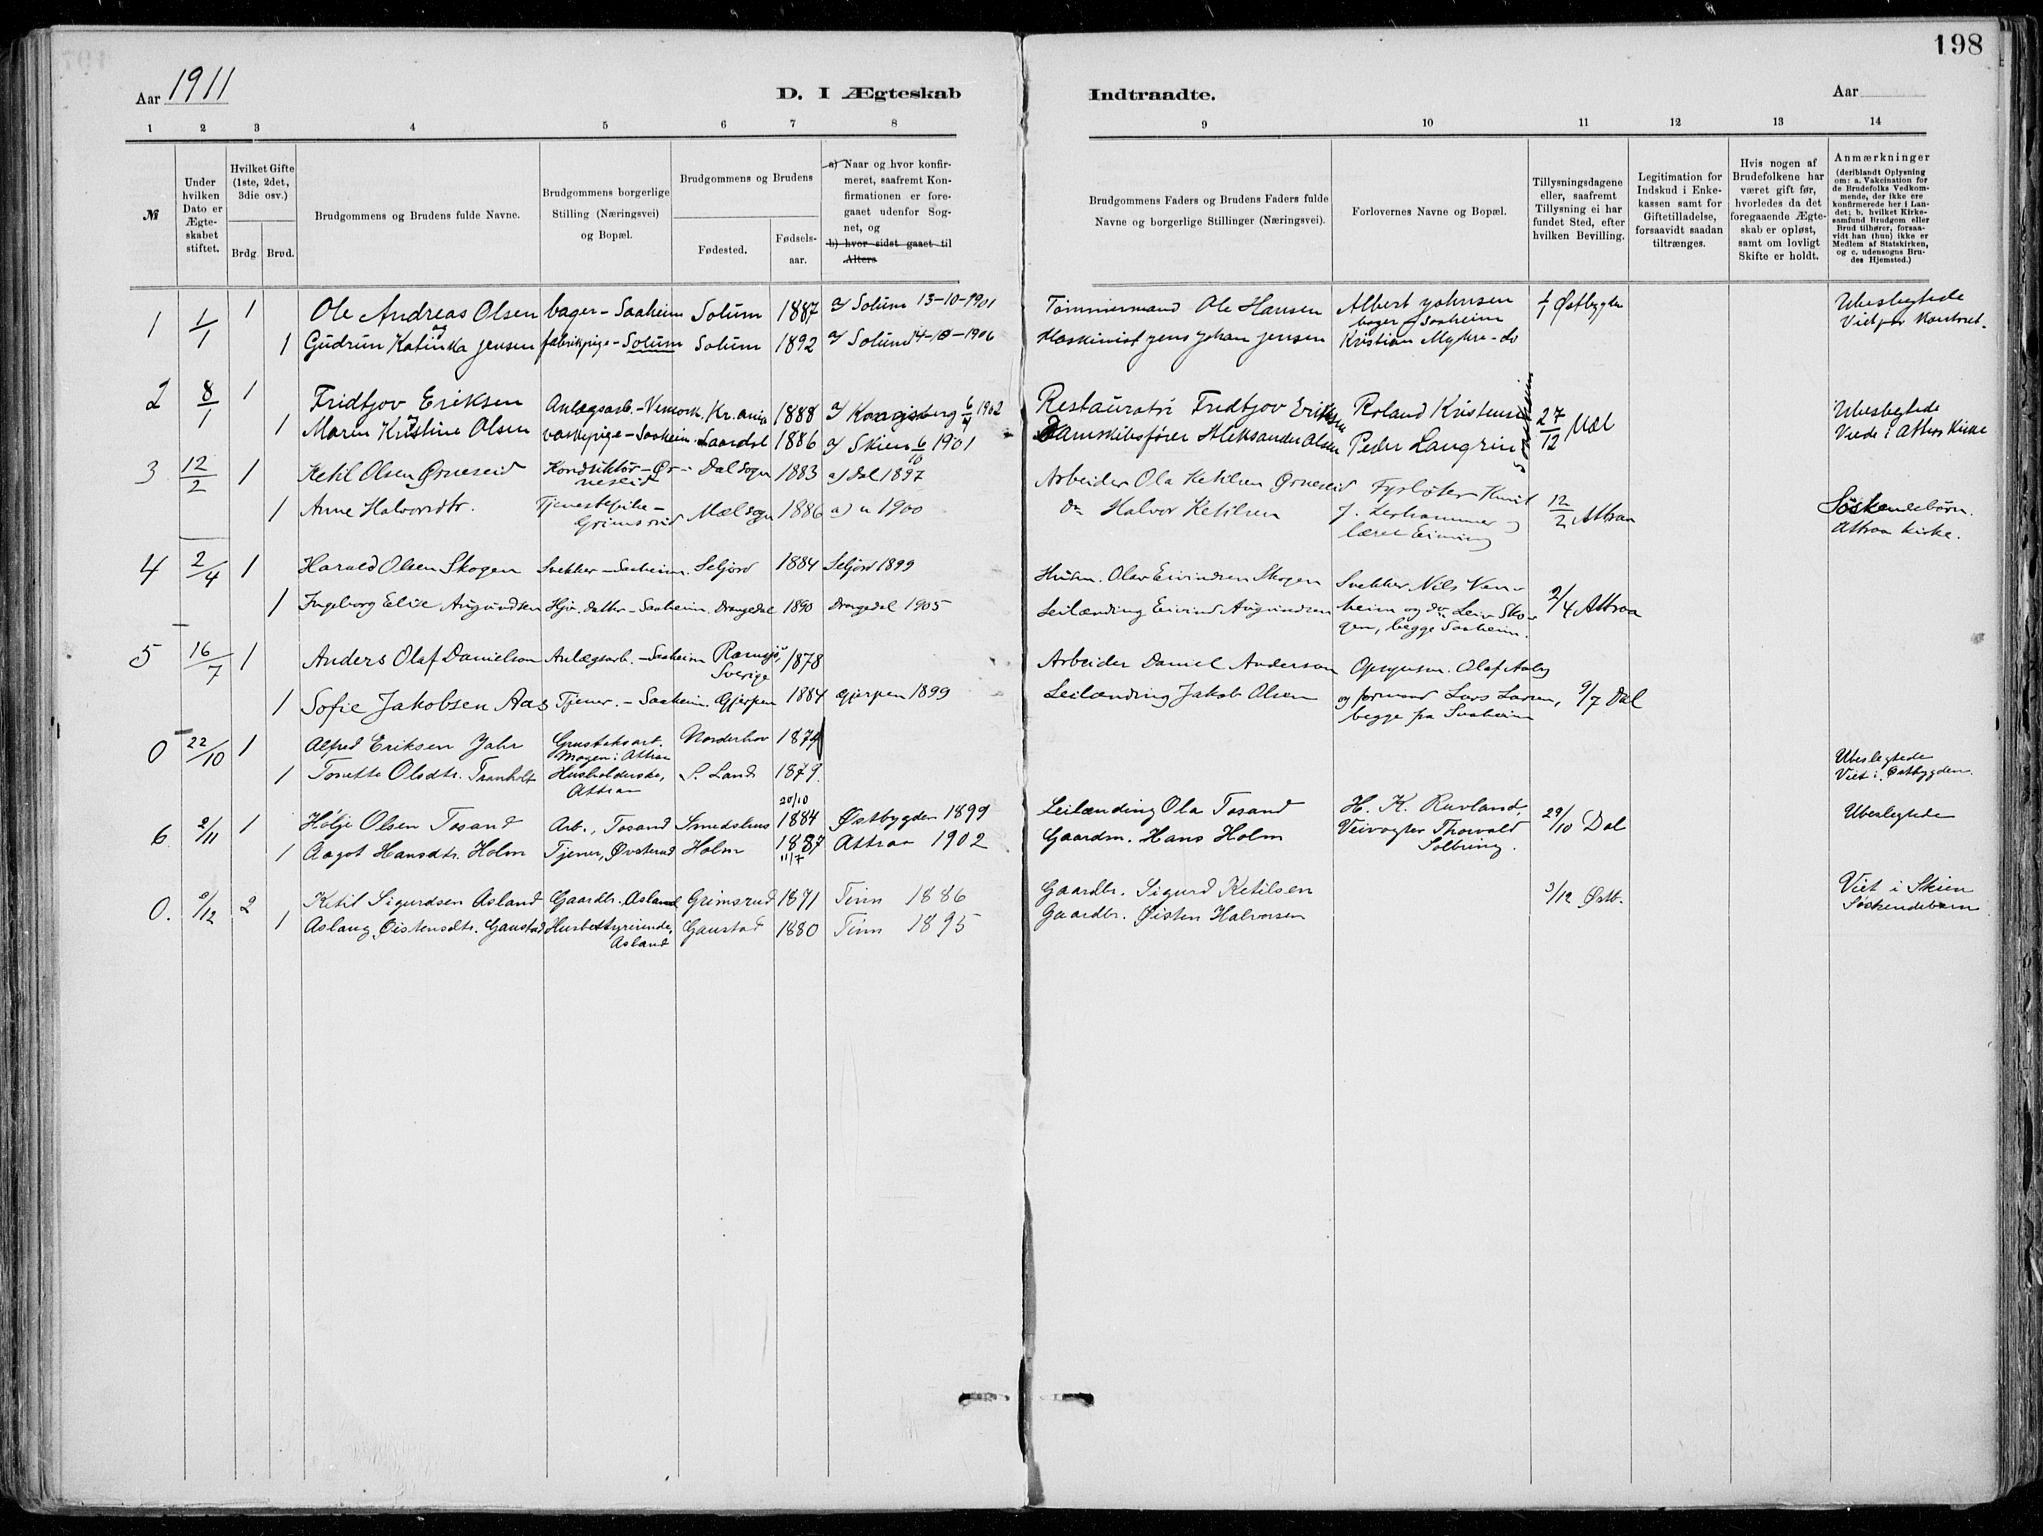 SAKO, Tinn kirkebøker, F/Fa/L0007: Ministerialbok nr. I 7, 1878-1922, s. 198